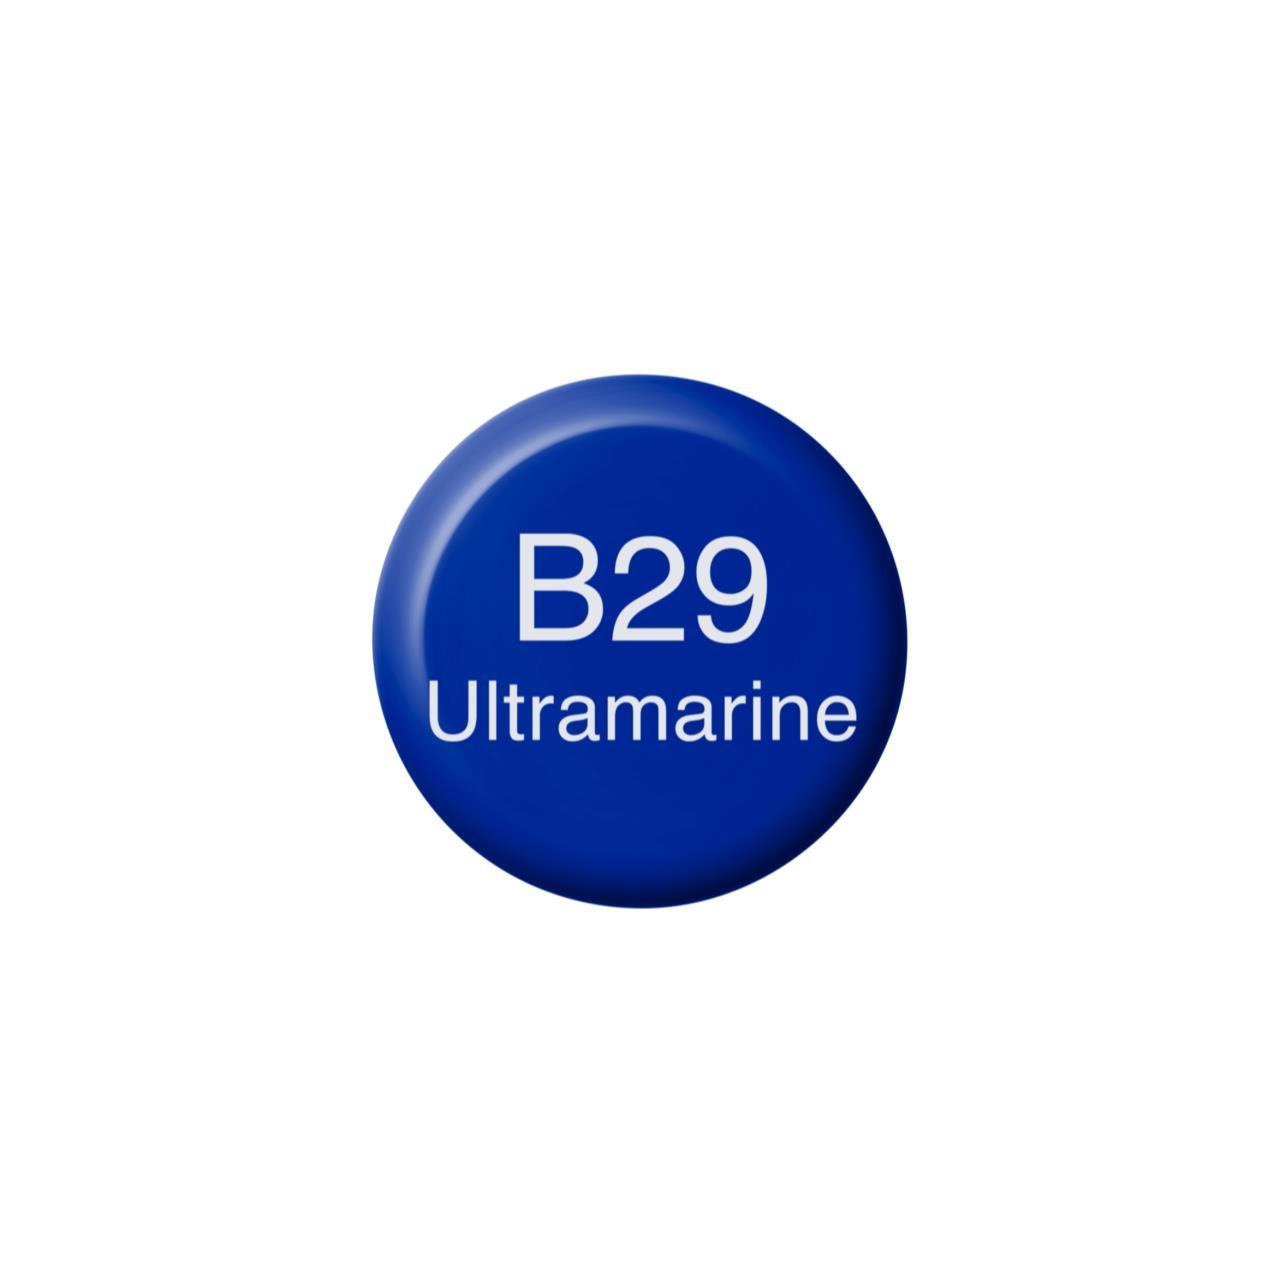 B29 Ultramarine, Copic Ink - 4511338055977